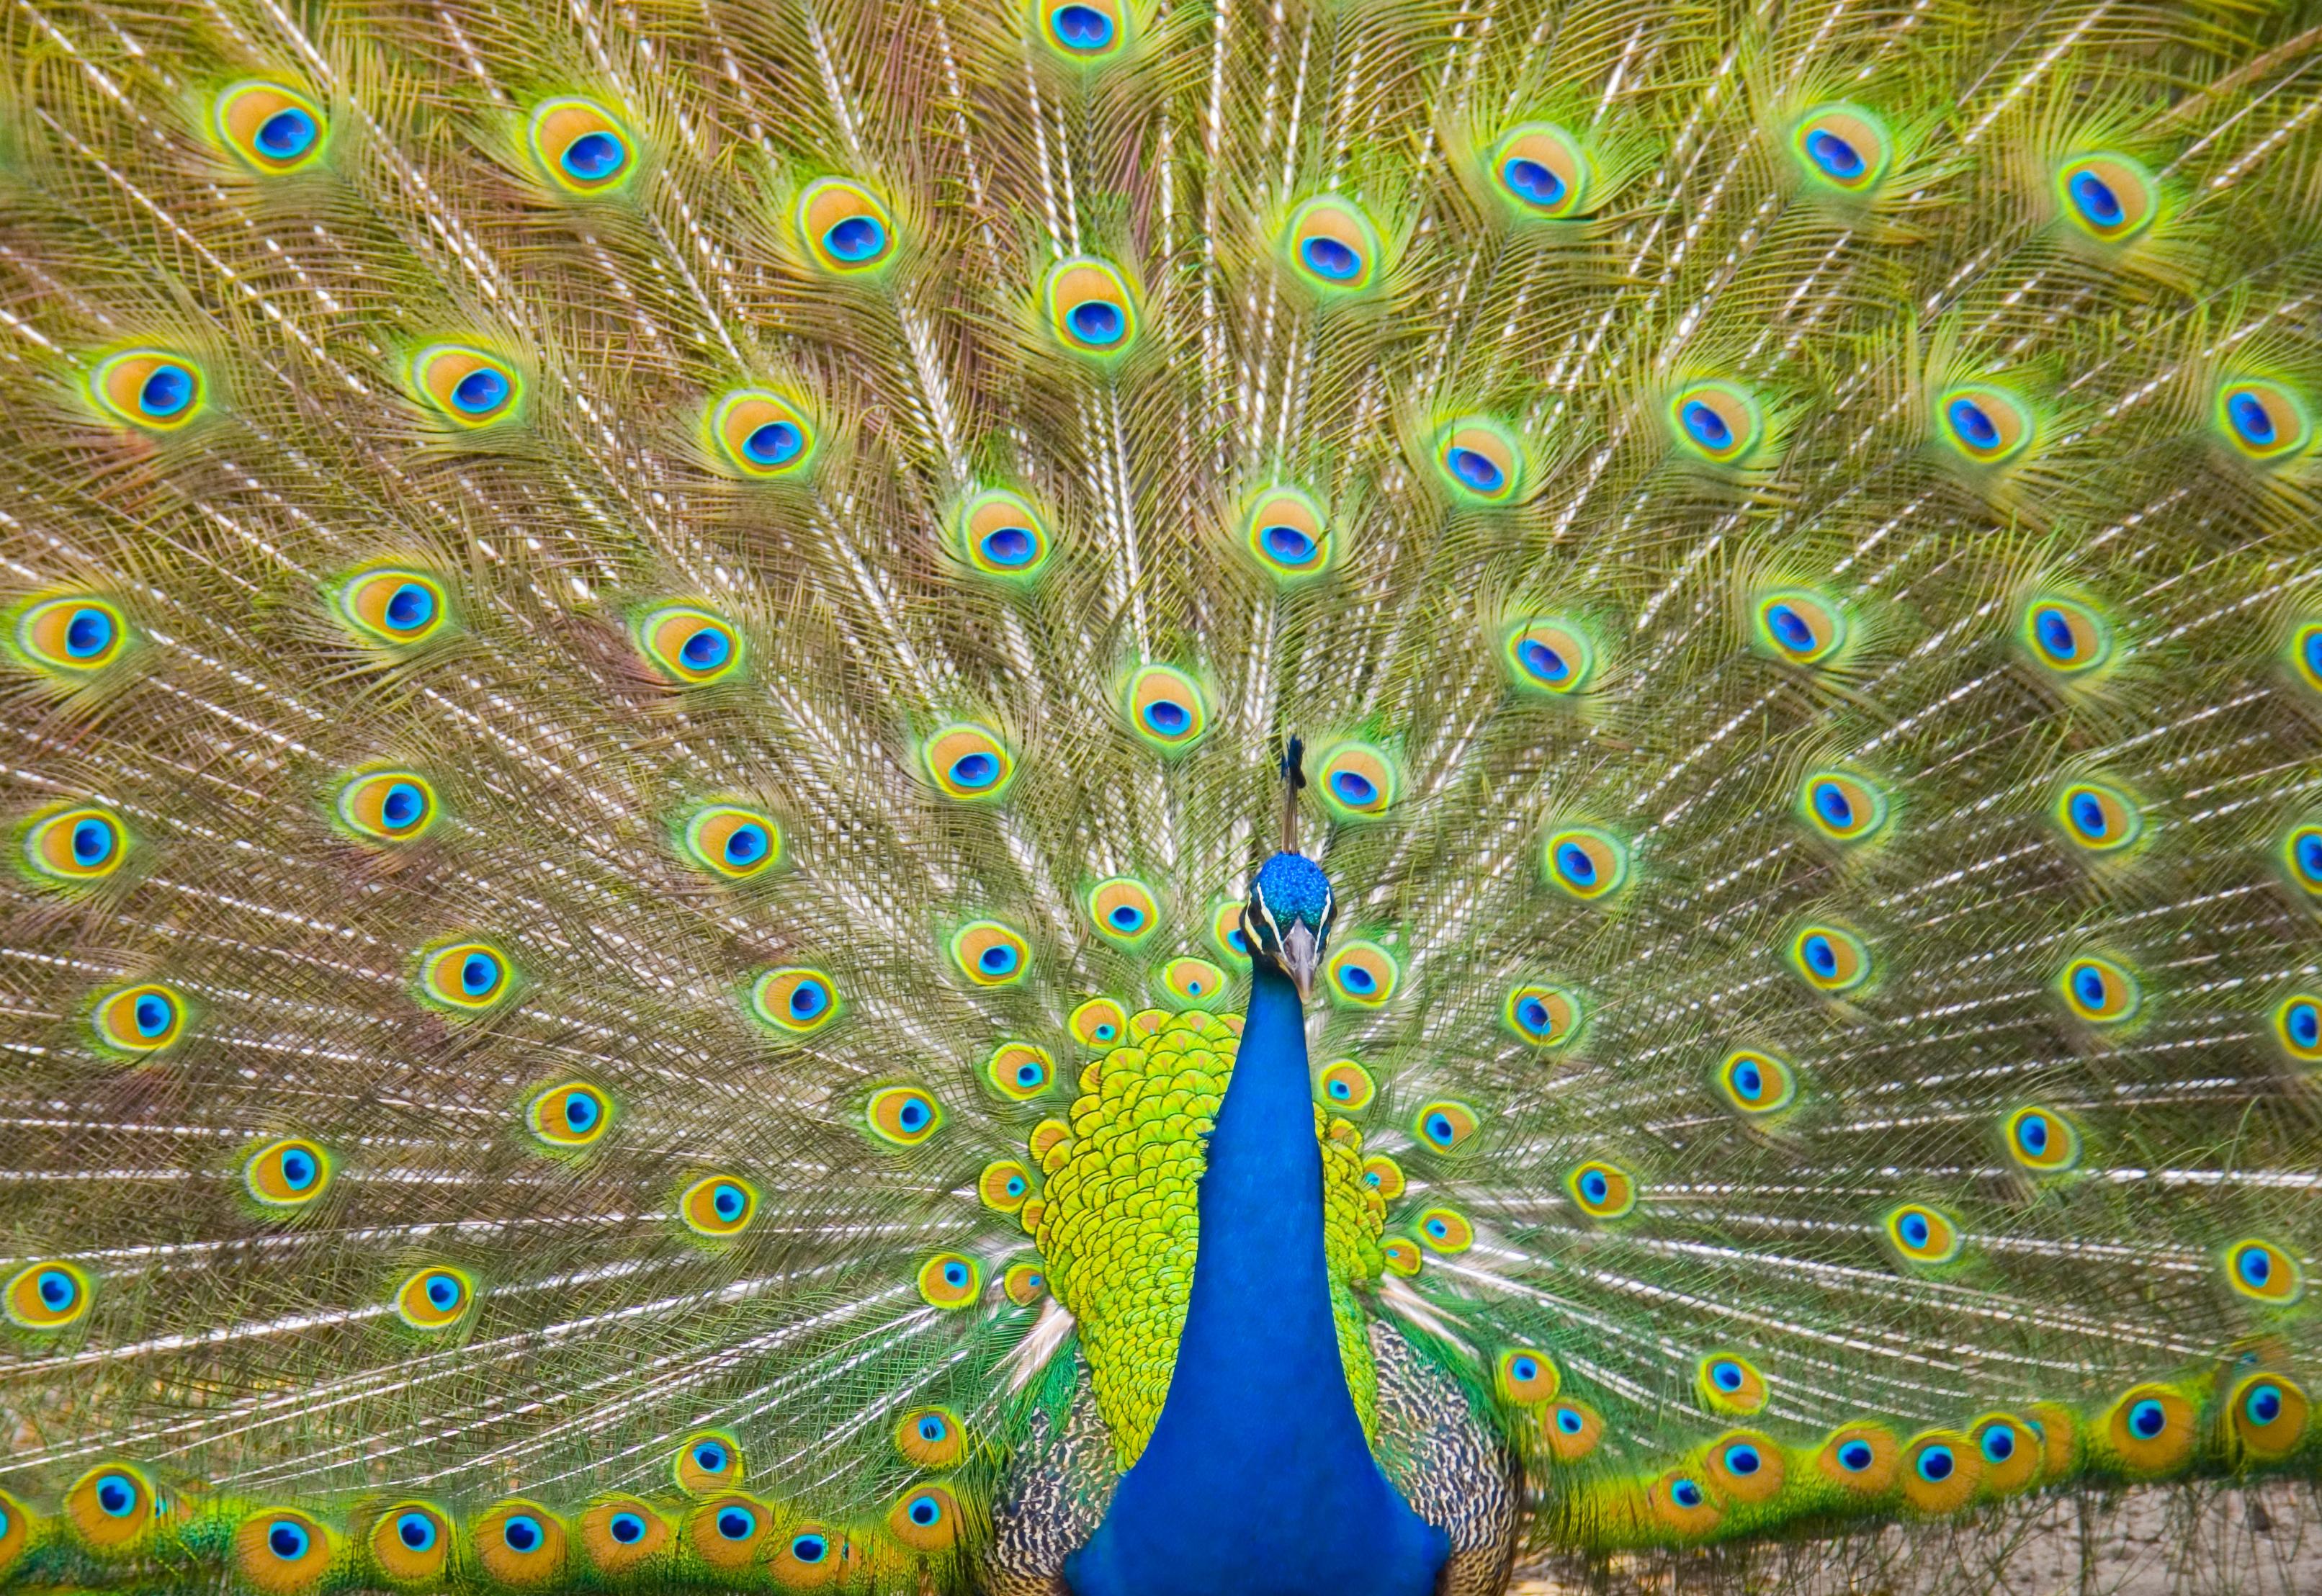 How Do Peacocks Mate?